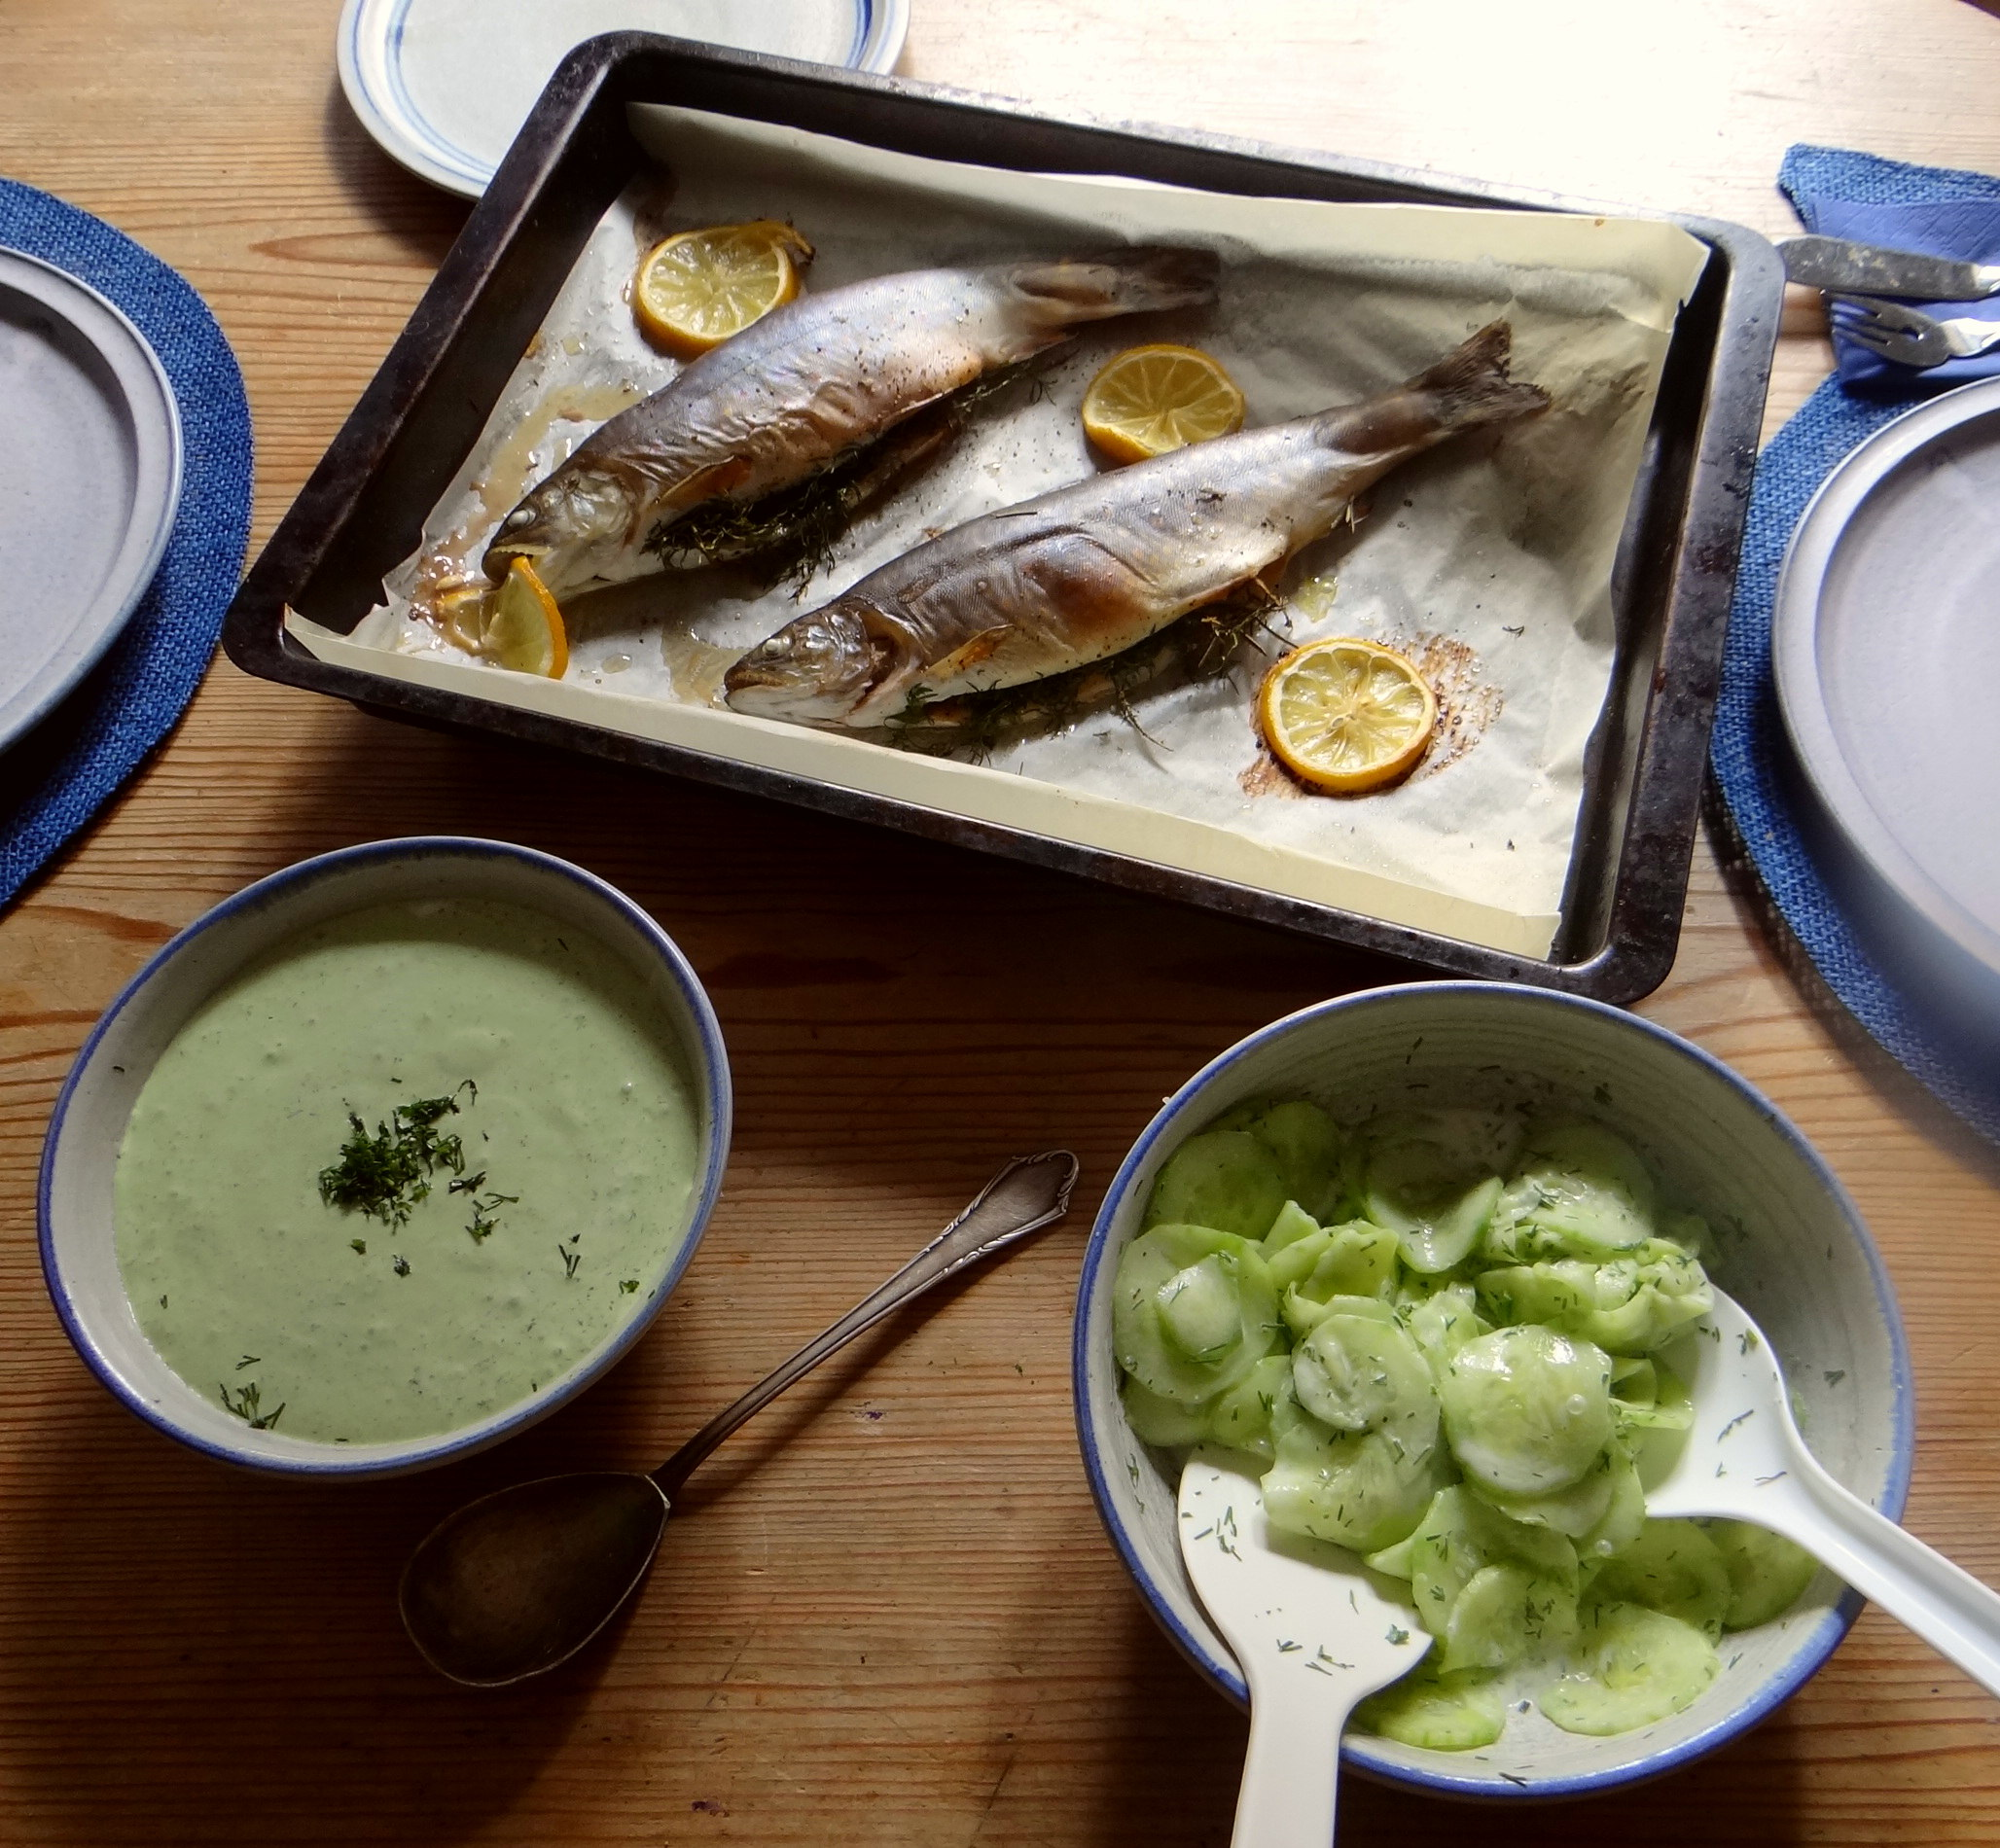 Saibling,Dillsoße,Kartoffeln,Gurkensalat (10)